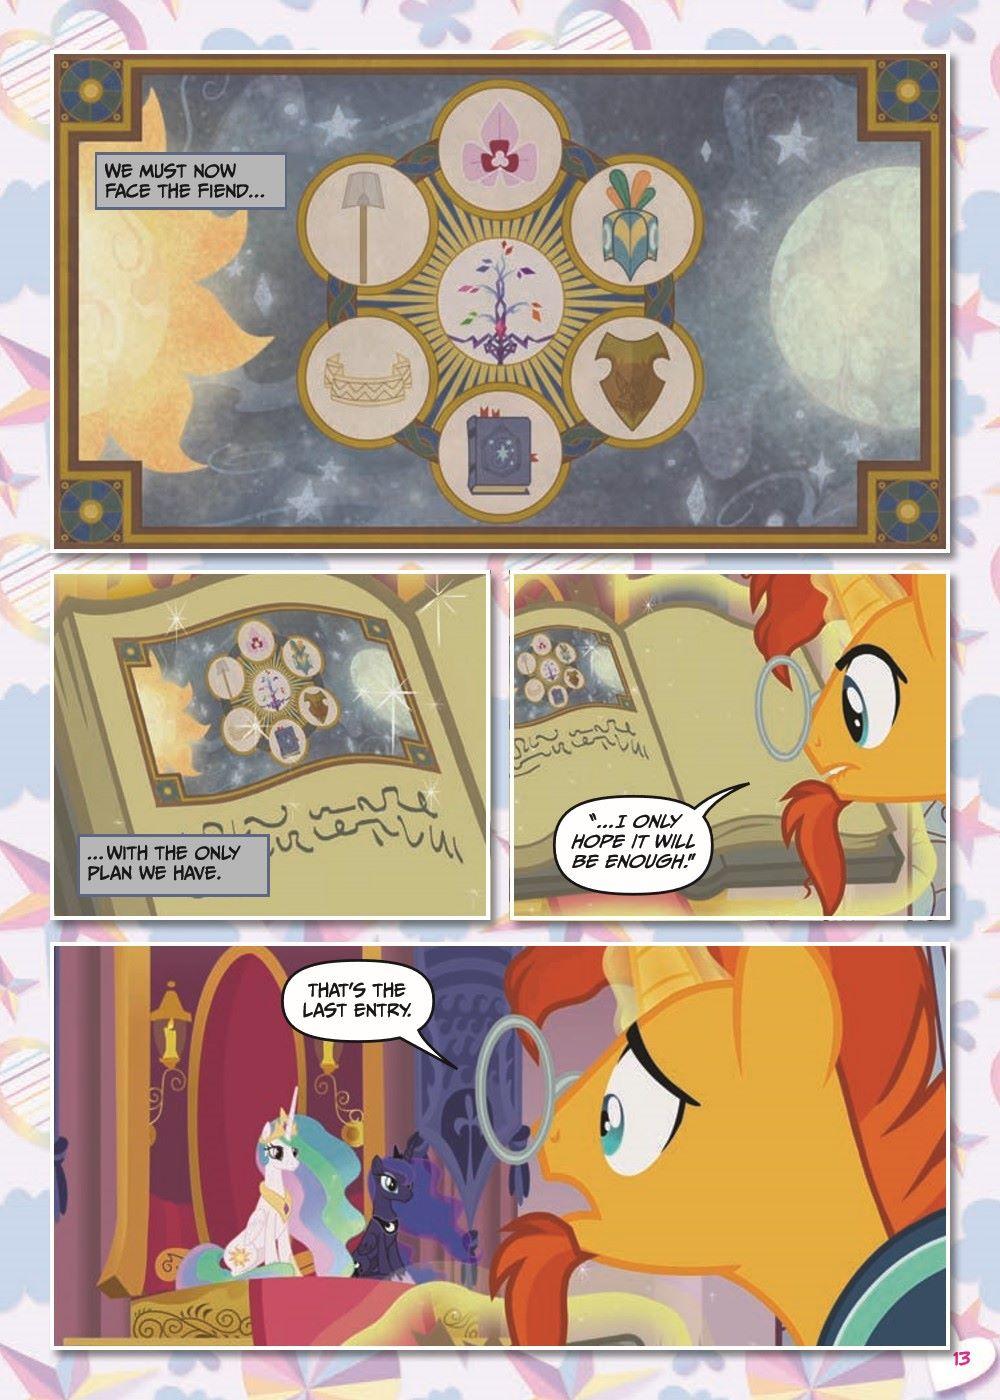 mlp-animatedV14-pr-8 ComicList Previews: MY LITTLE PONY VOLUME 14 SHADOWPLAY TP